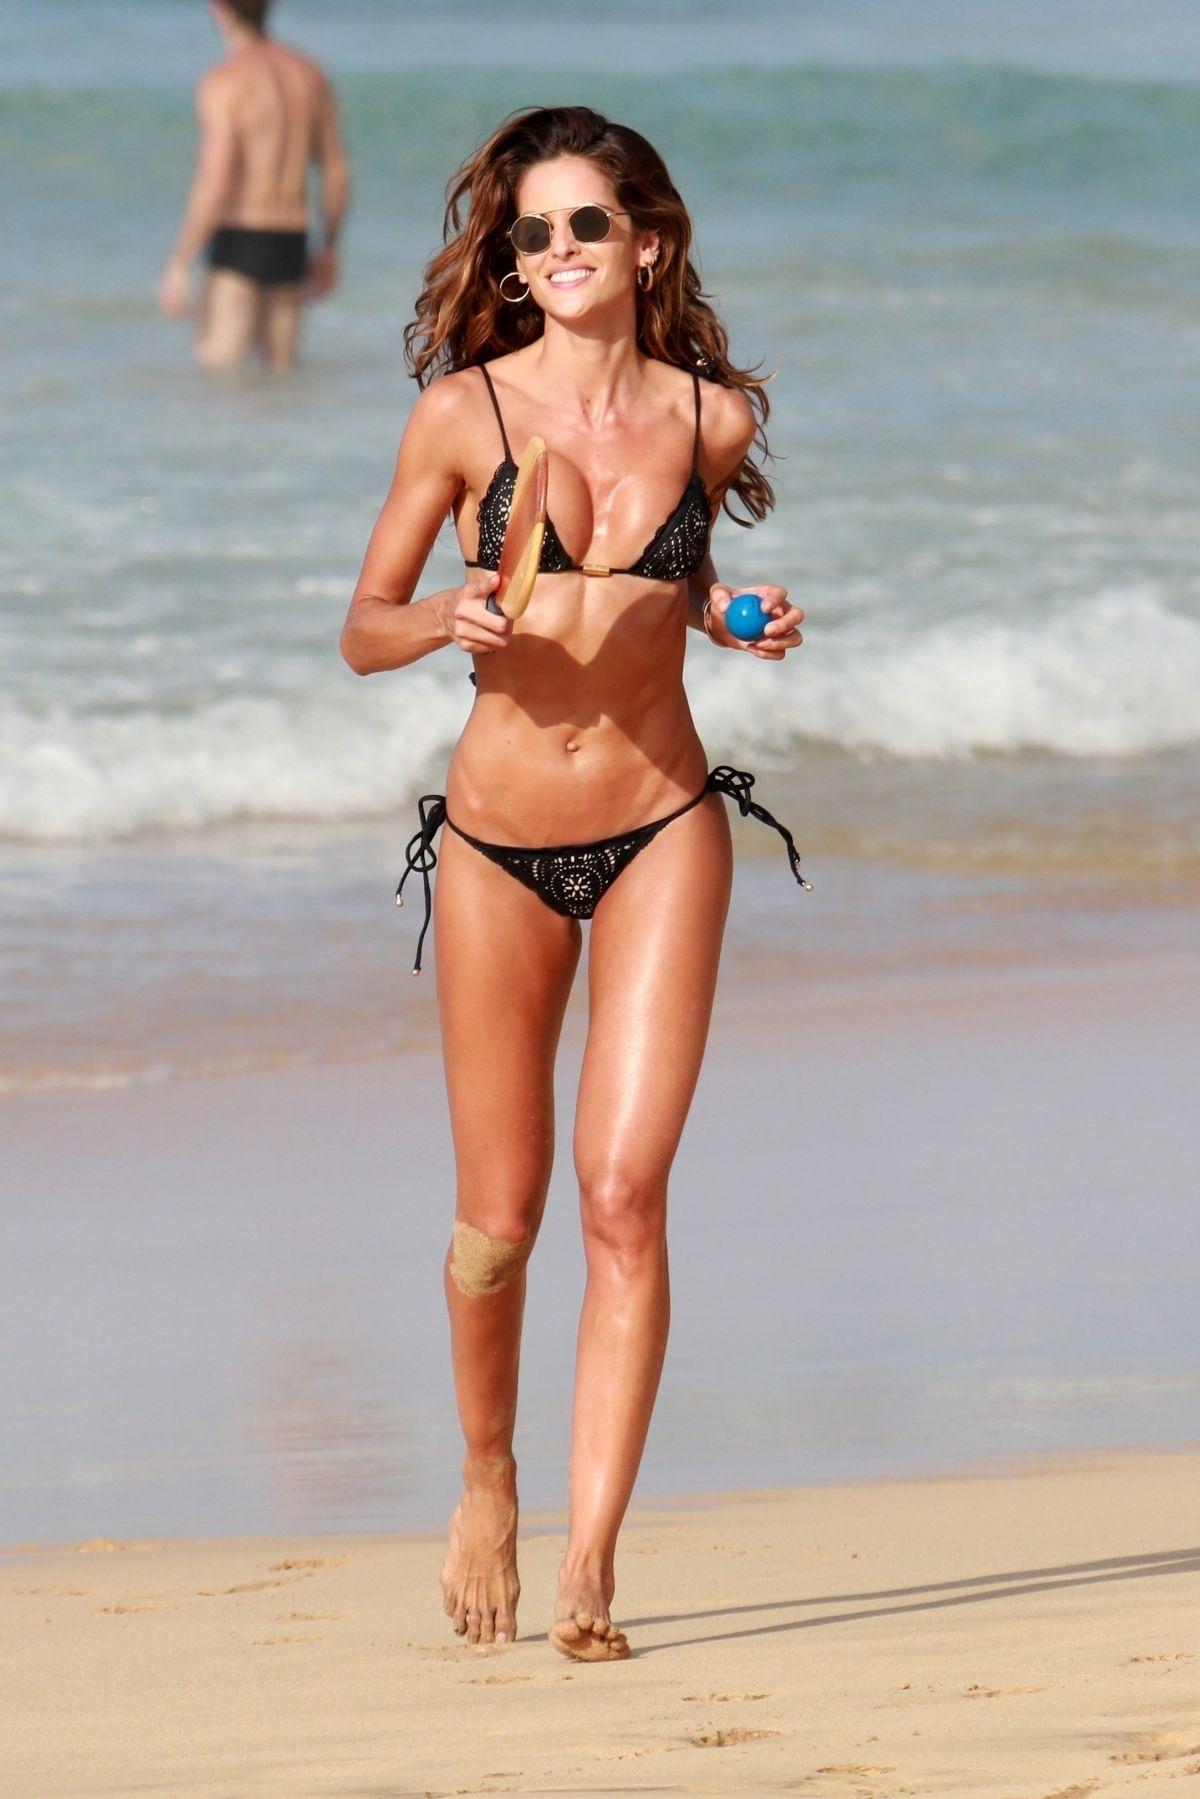 Izabel Goulart in Bikini and Kevin Trapp on the beach in Fernando de Noronha Pic 34 of 35